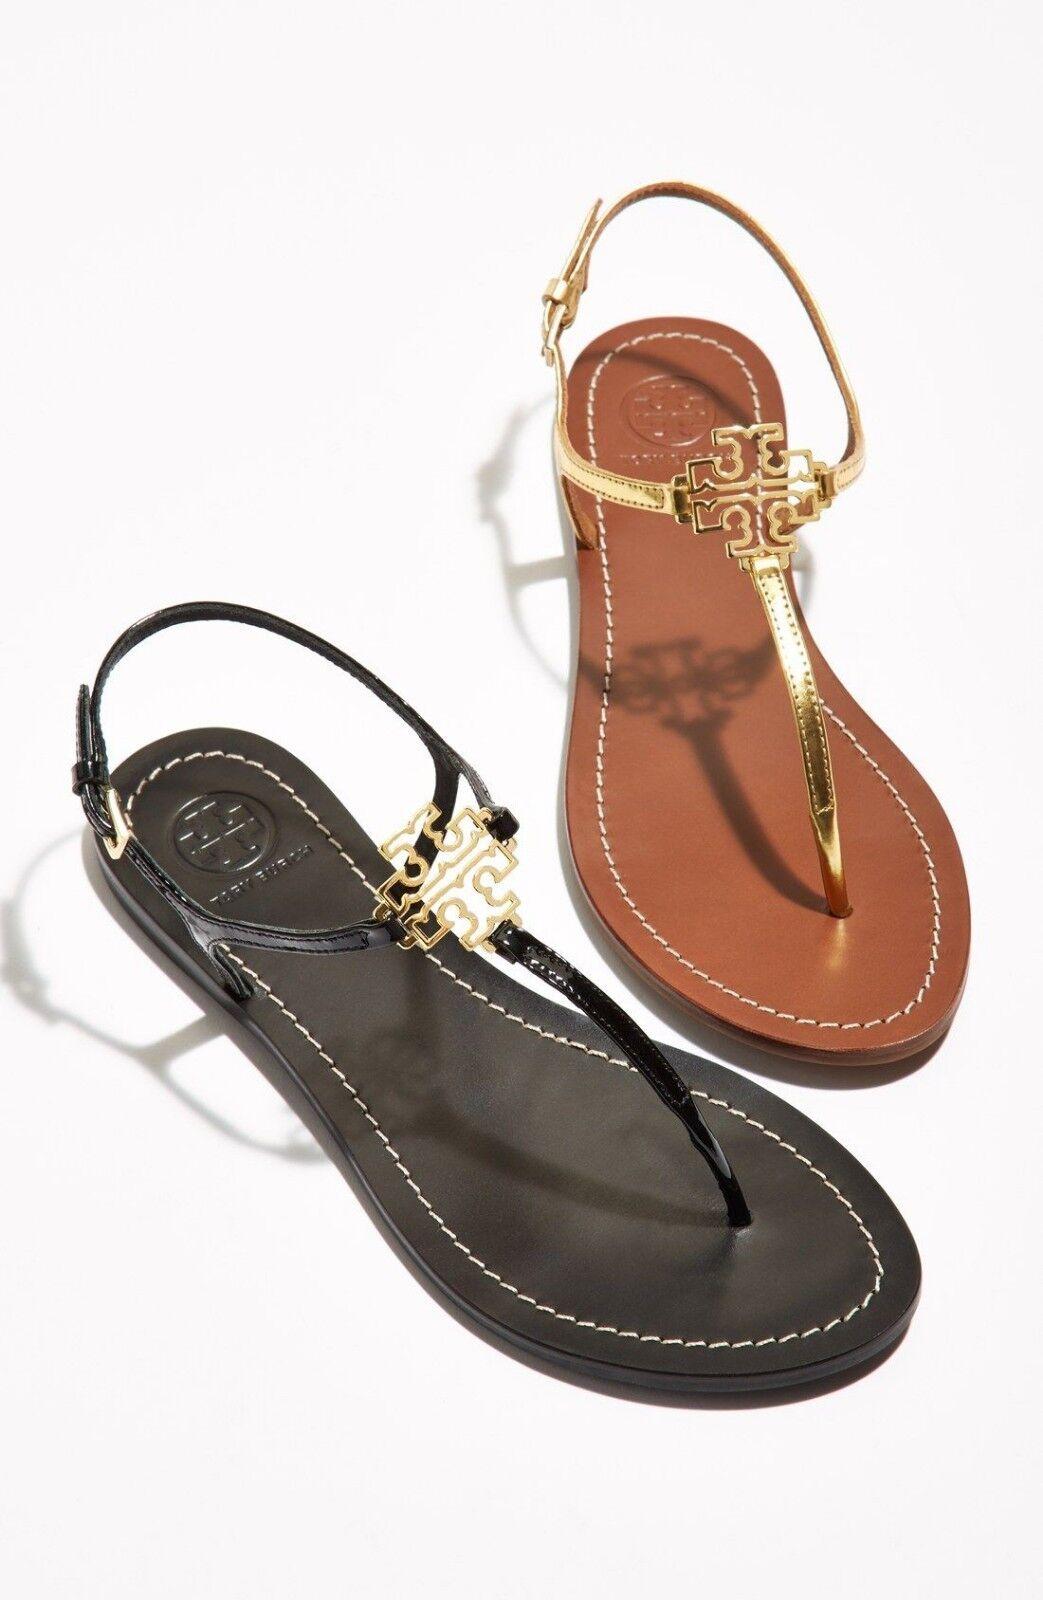 TORY BURCH Melinda Flat Thong Sandal  MIRROR METALLIC oro o Sandali nero  servizio onesto